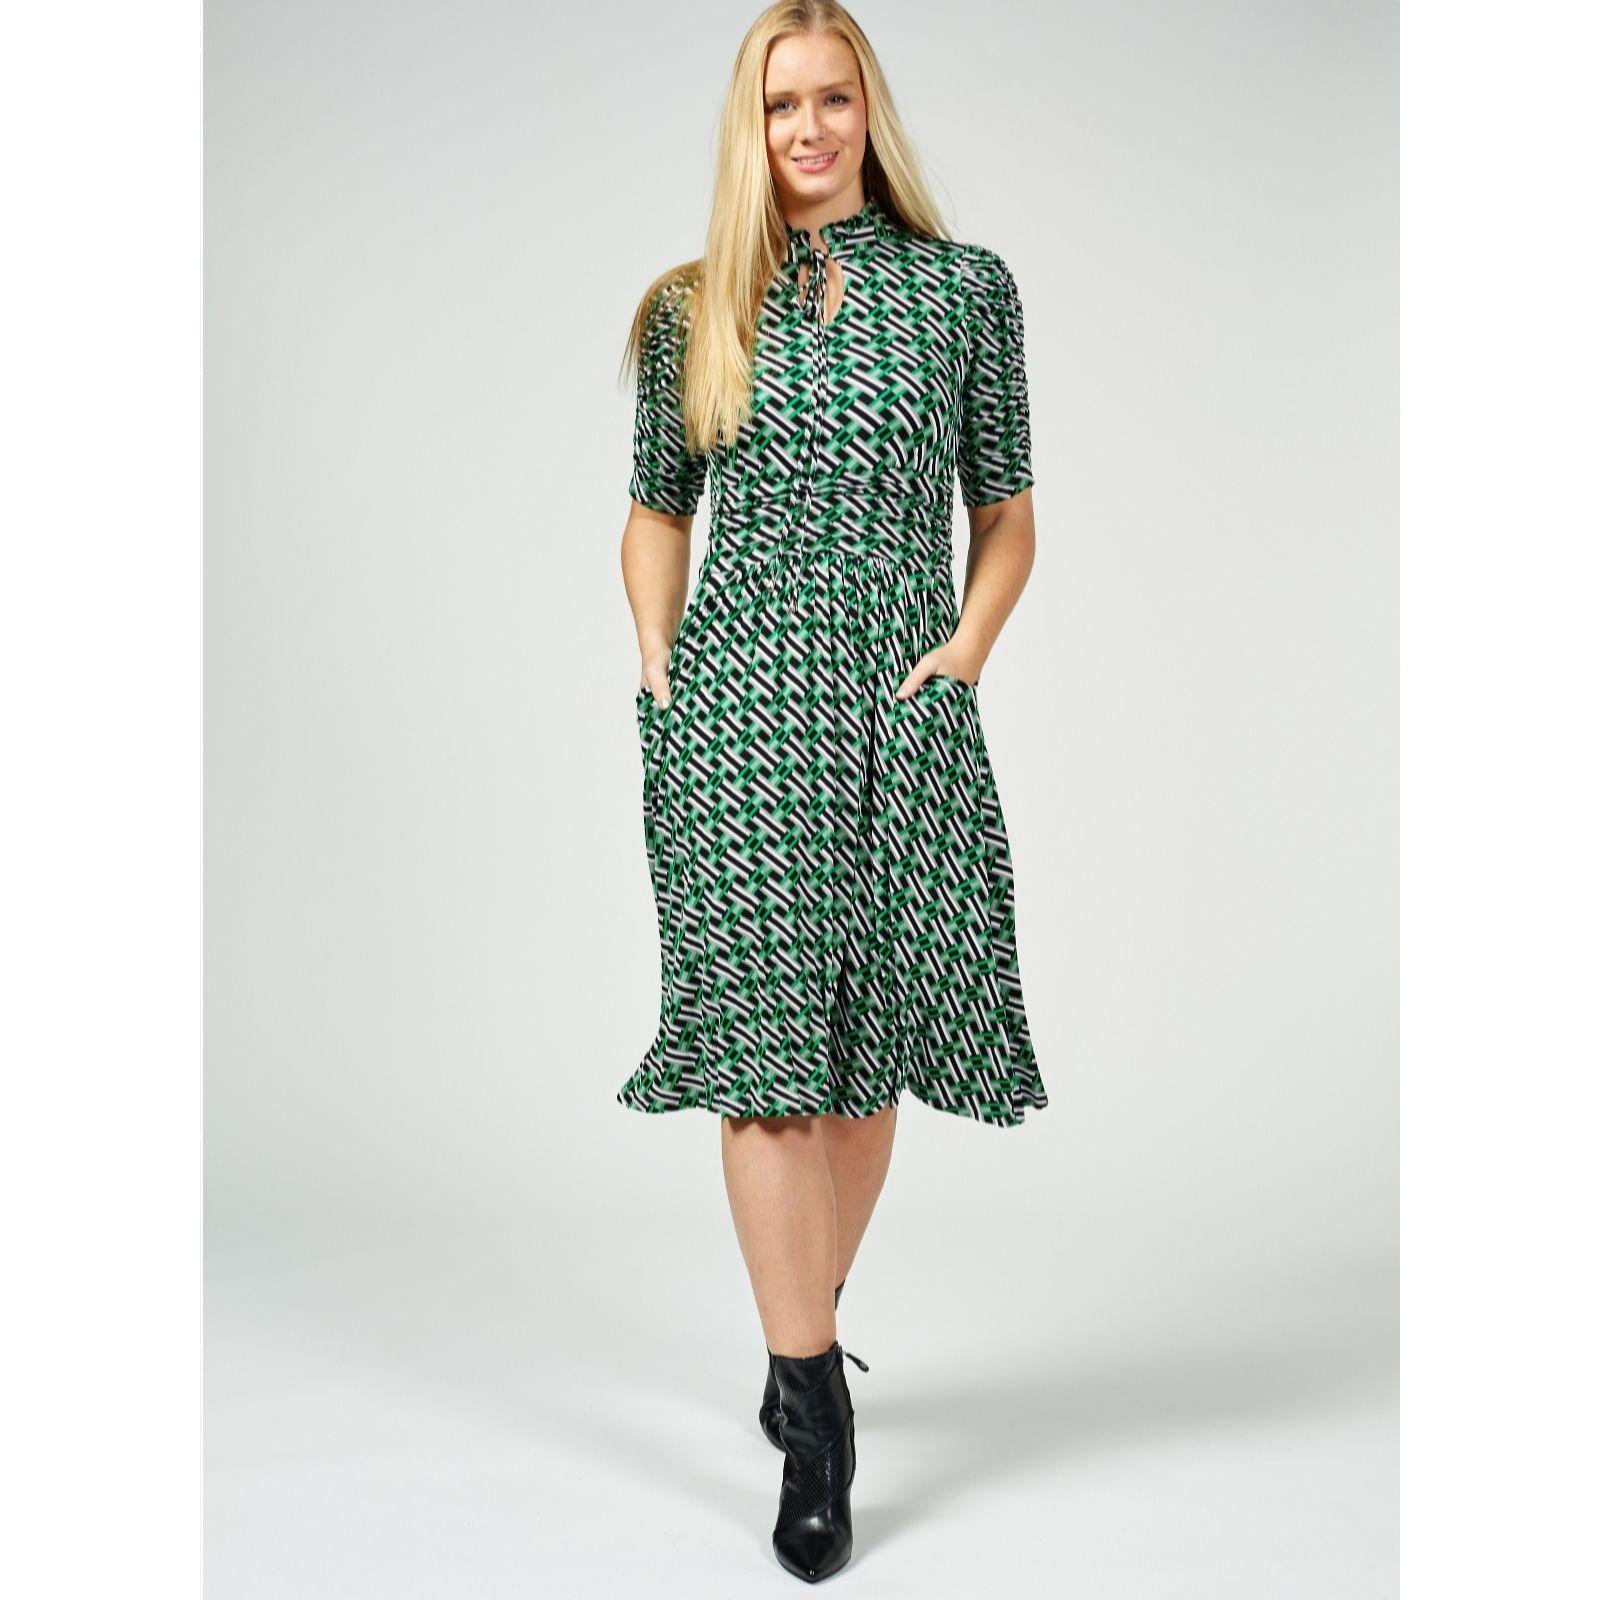 9557f5e679b Jolie Moi 3 4 Sleeve Printed Midi Dress - QVC UK